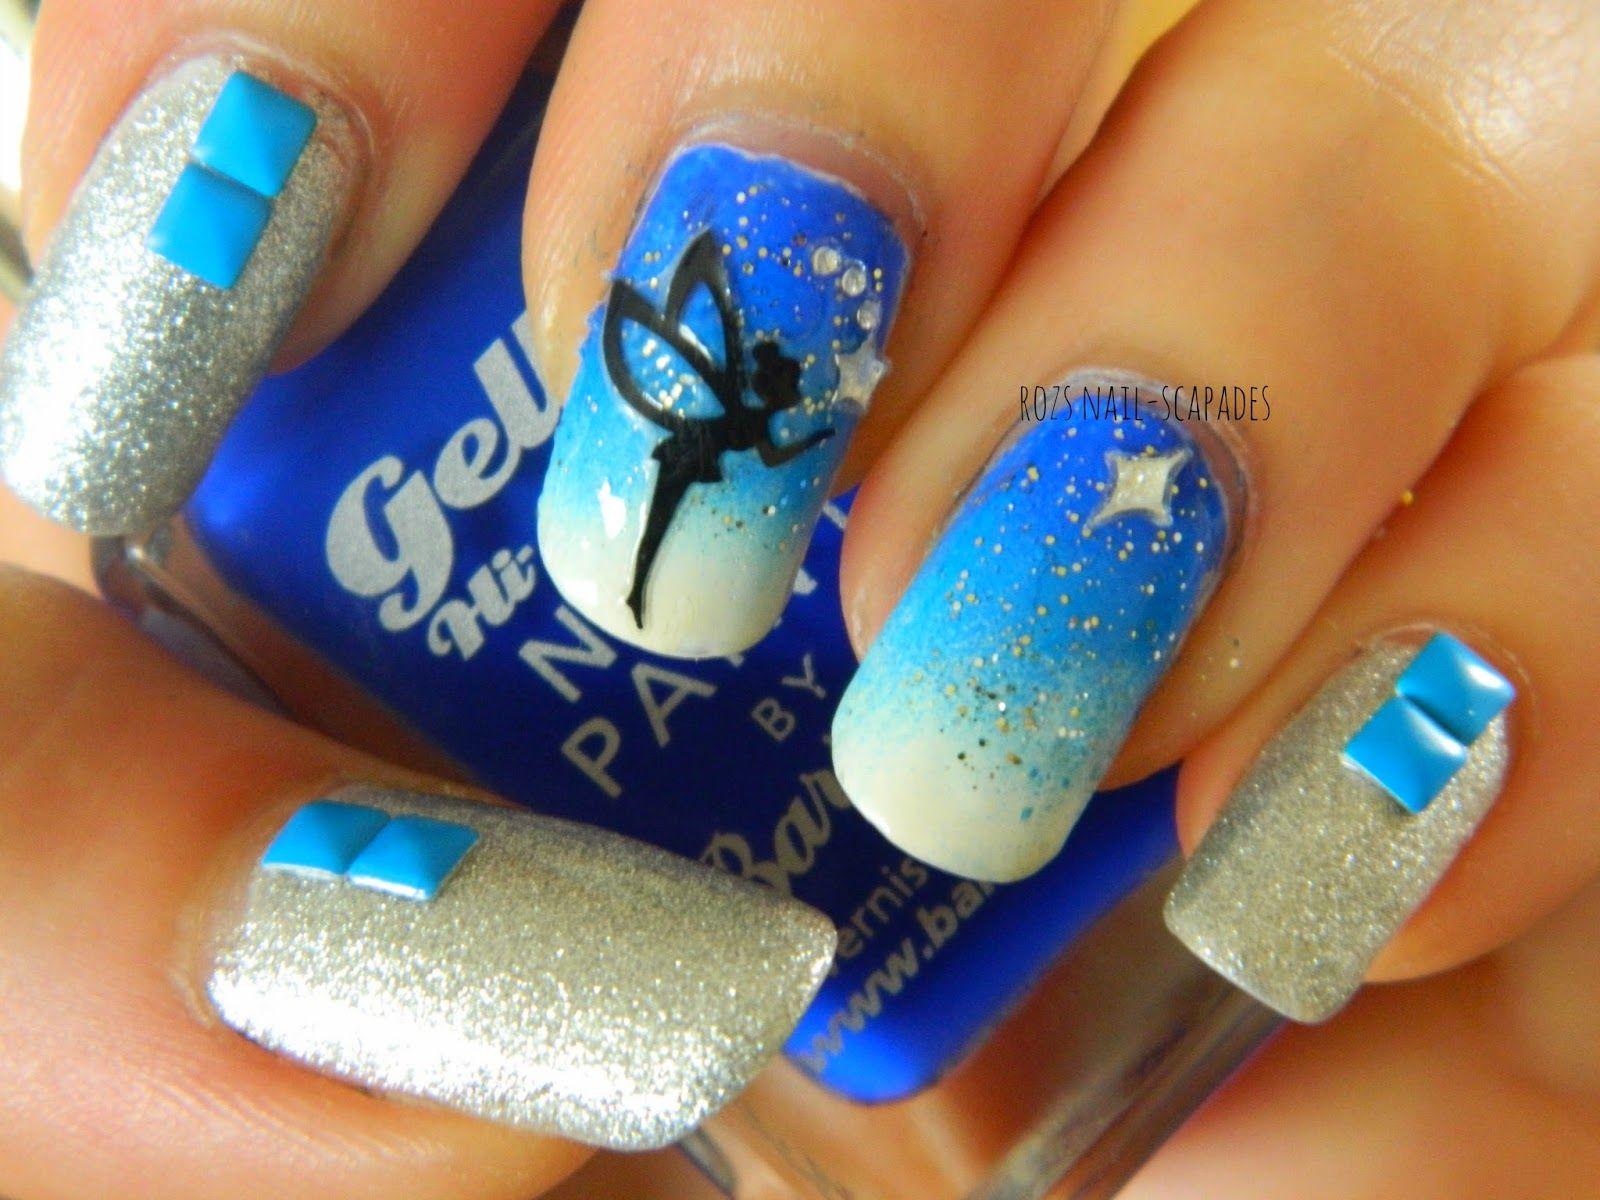 International Nail Art Day 2014, pixie gradient   nails   Pinterest ...